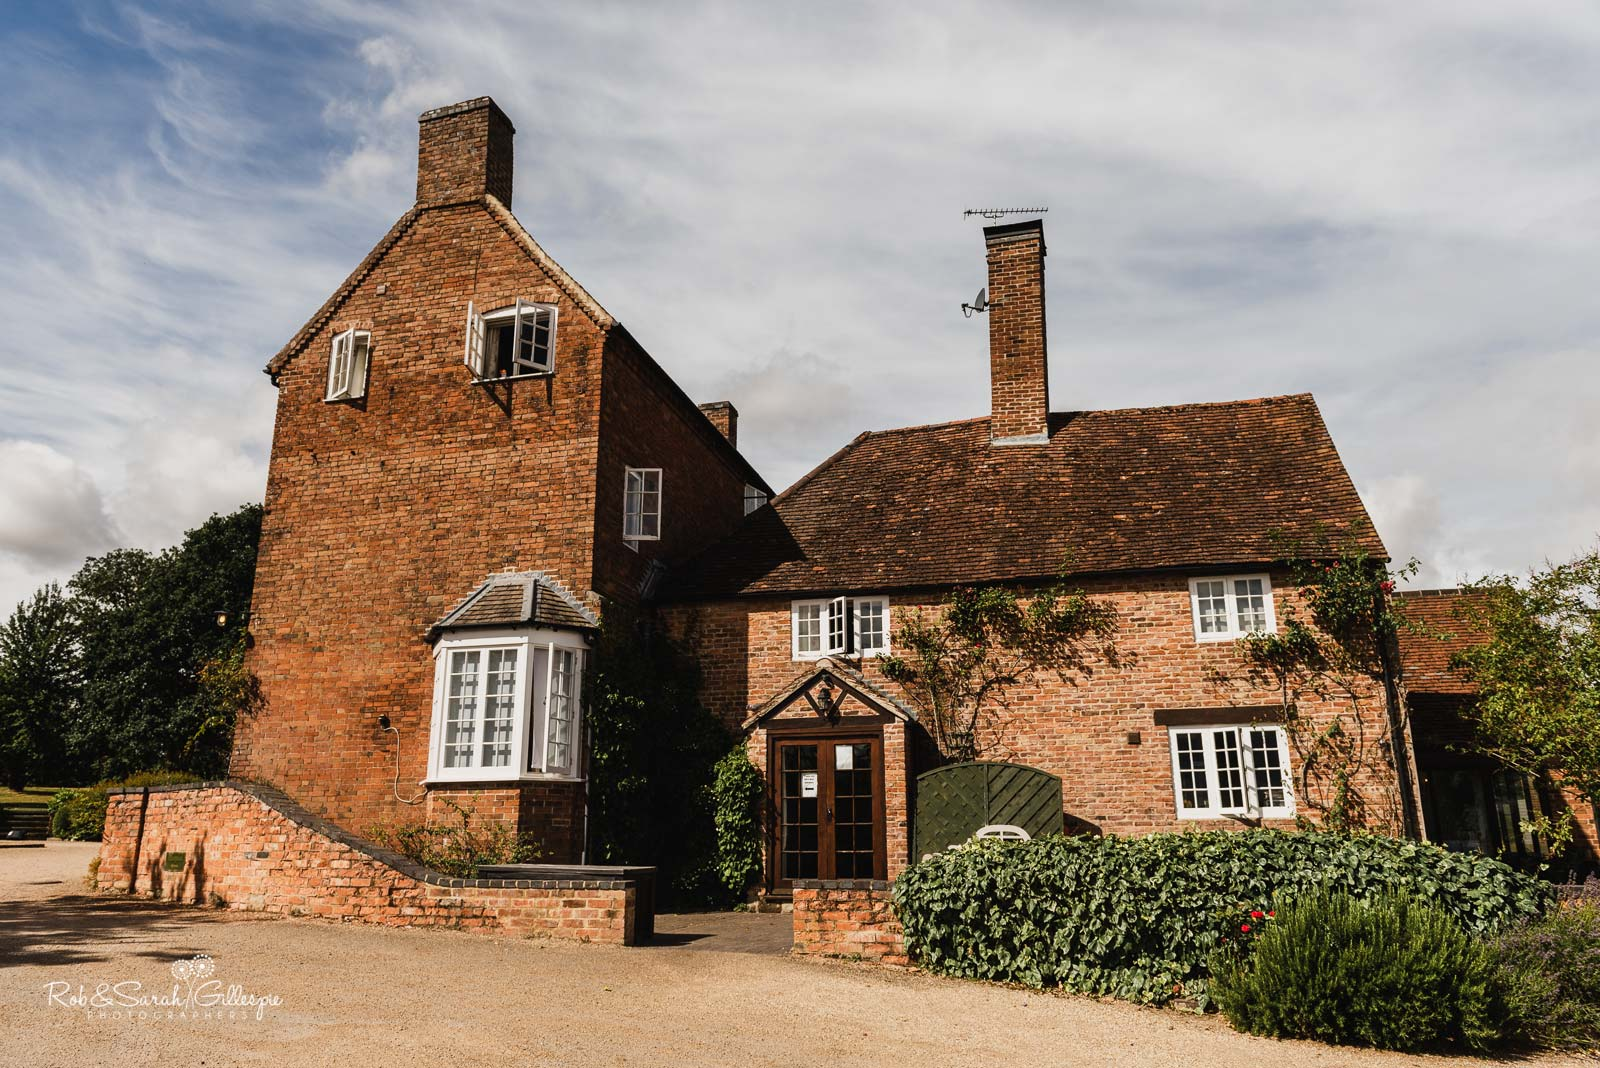 Warwickshire wedding venue Wethele Manor